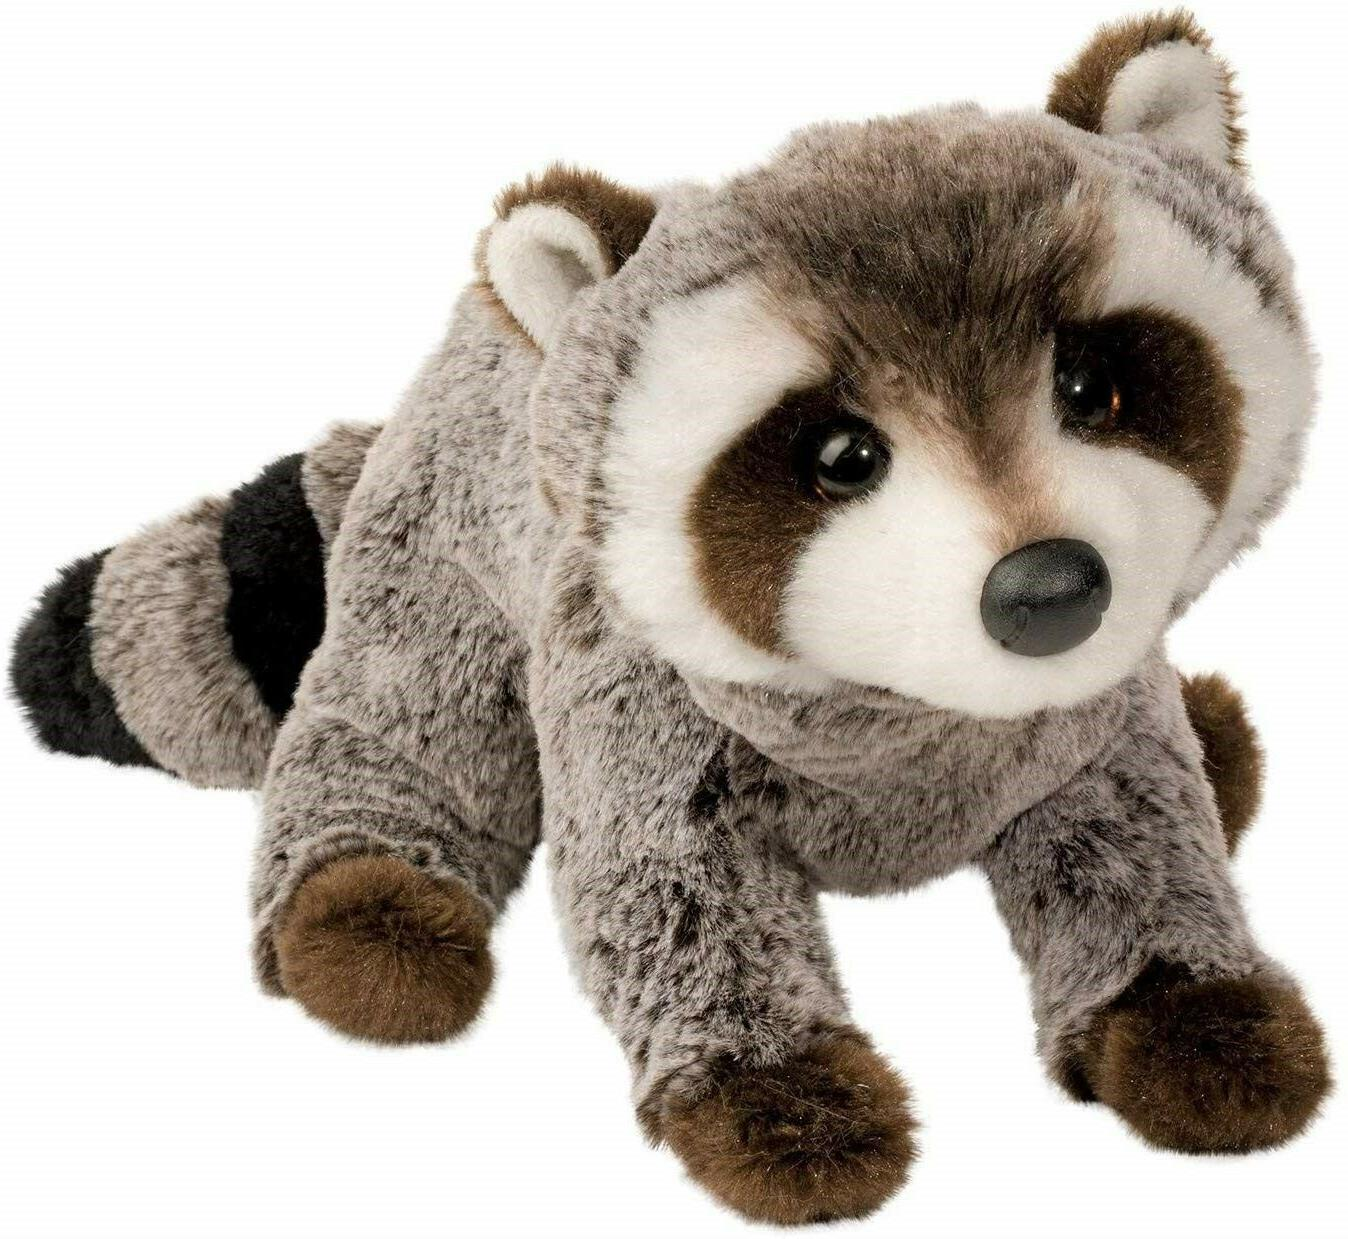 ringo the plush raccoon stuffed animal by